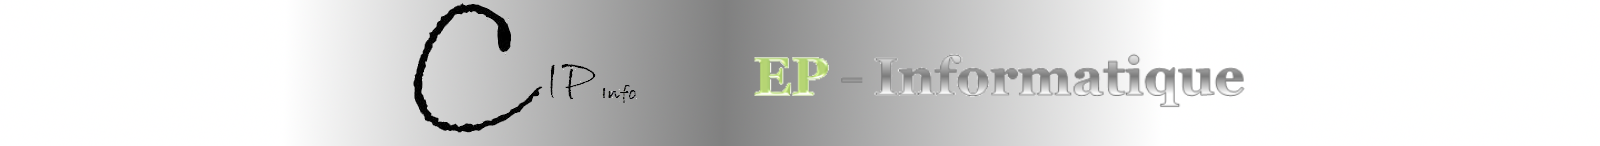 EP-Informatique